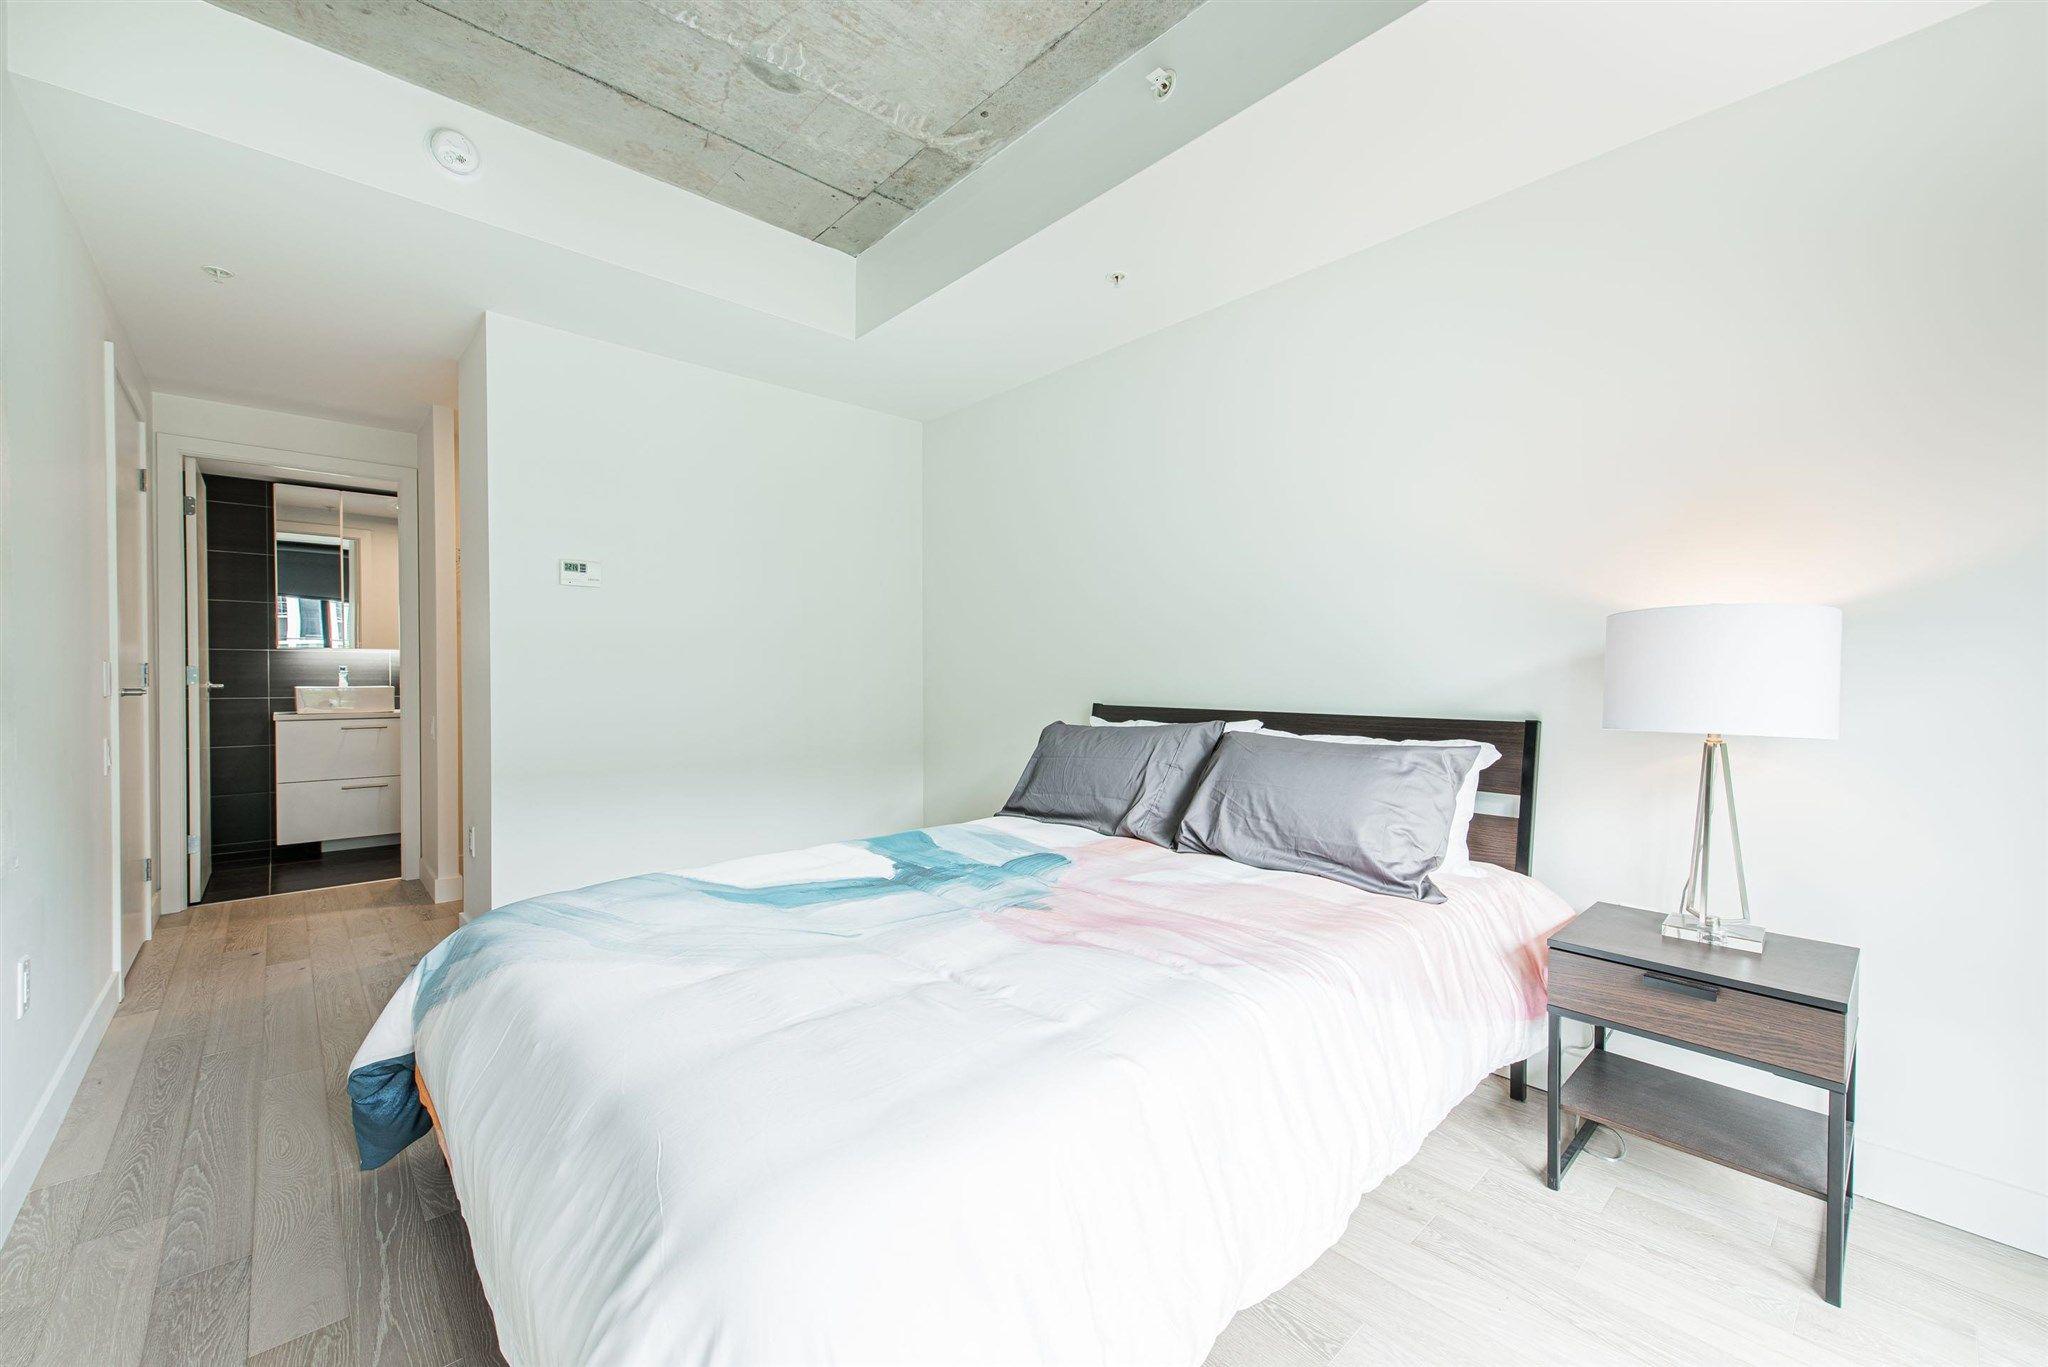 Photo 22: Photos: 105 1048 Wellington Street in Halifax: 2-Halifax South Residential for sale (Halifax-Dartmouth)  : MLS®# 202100816